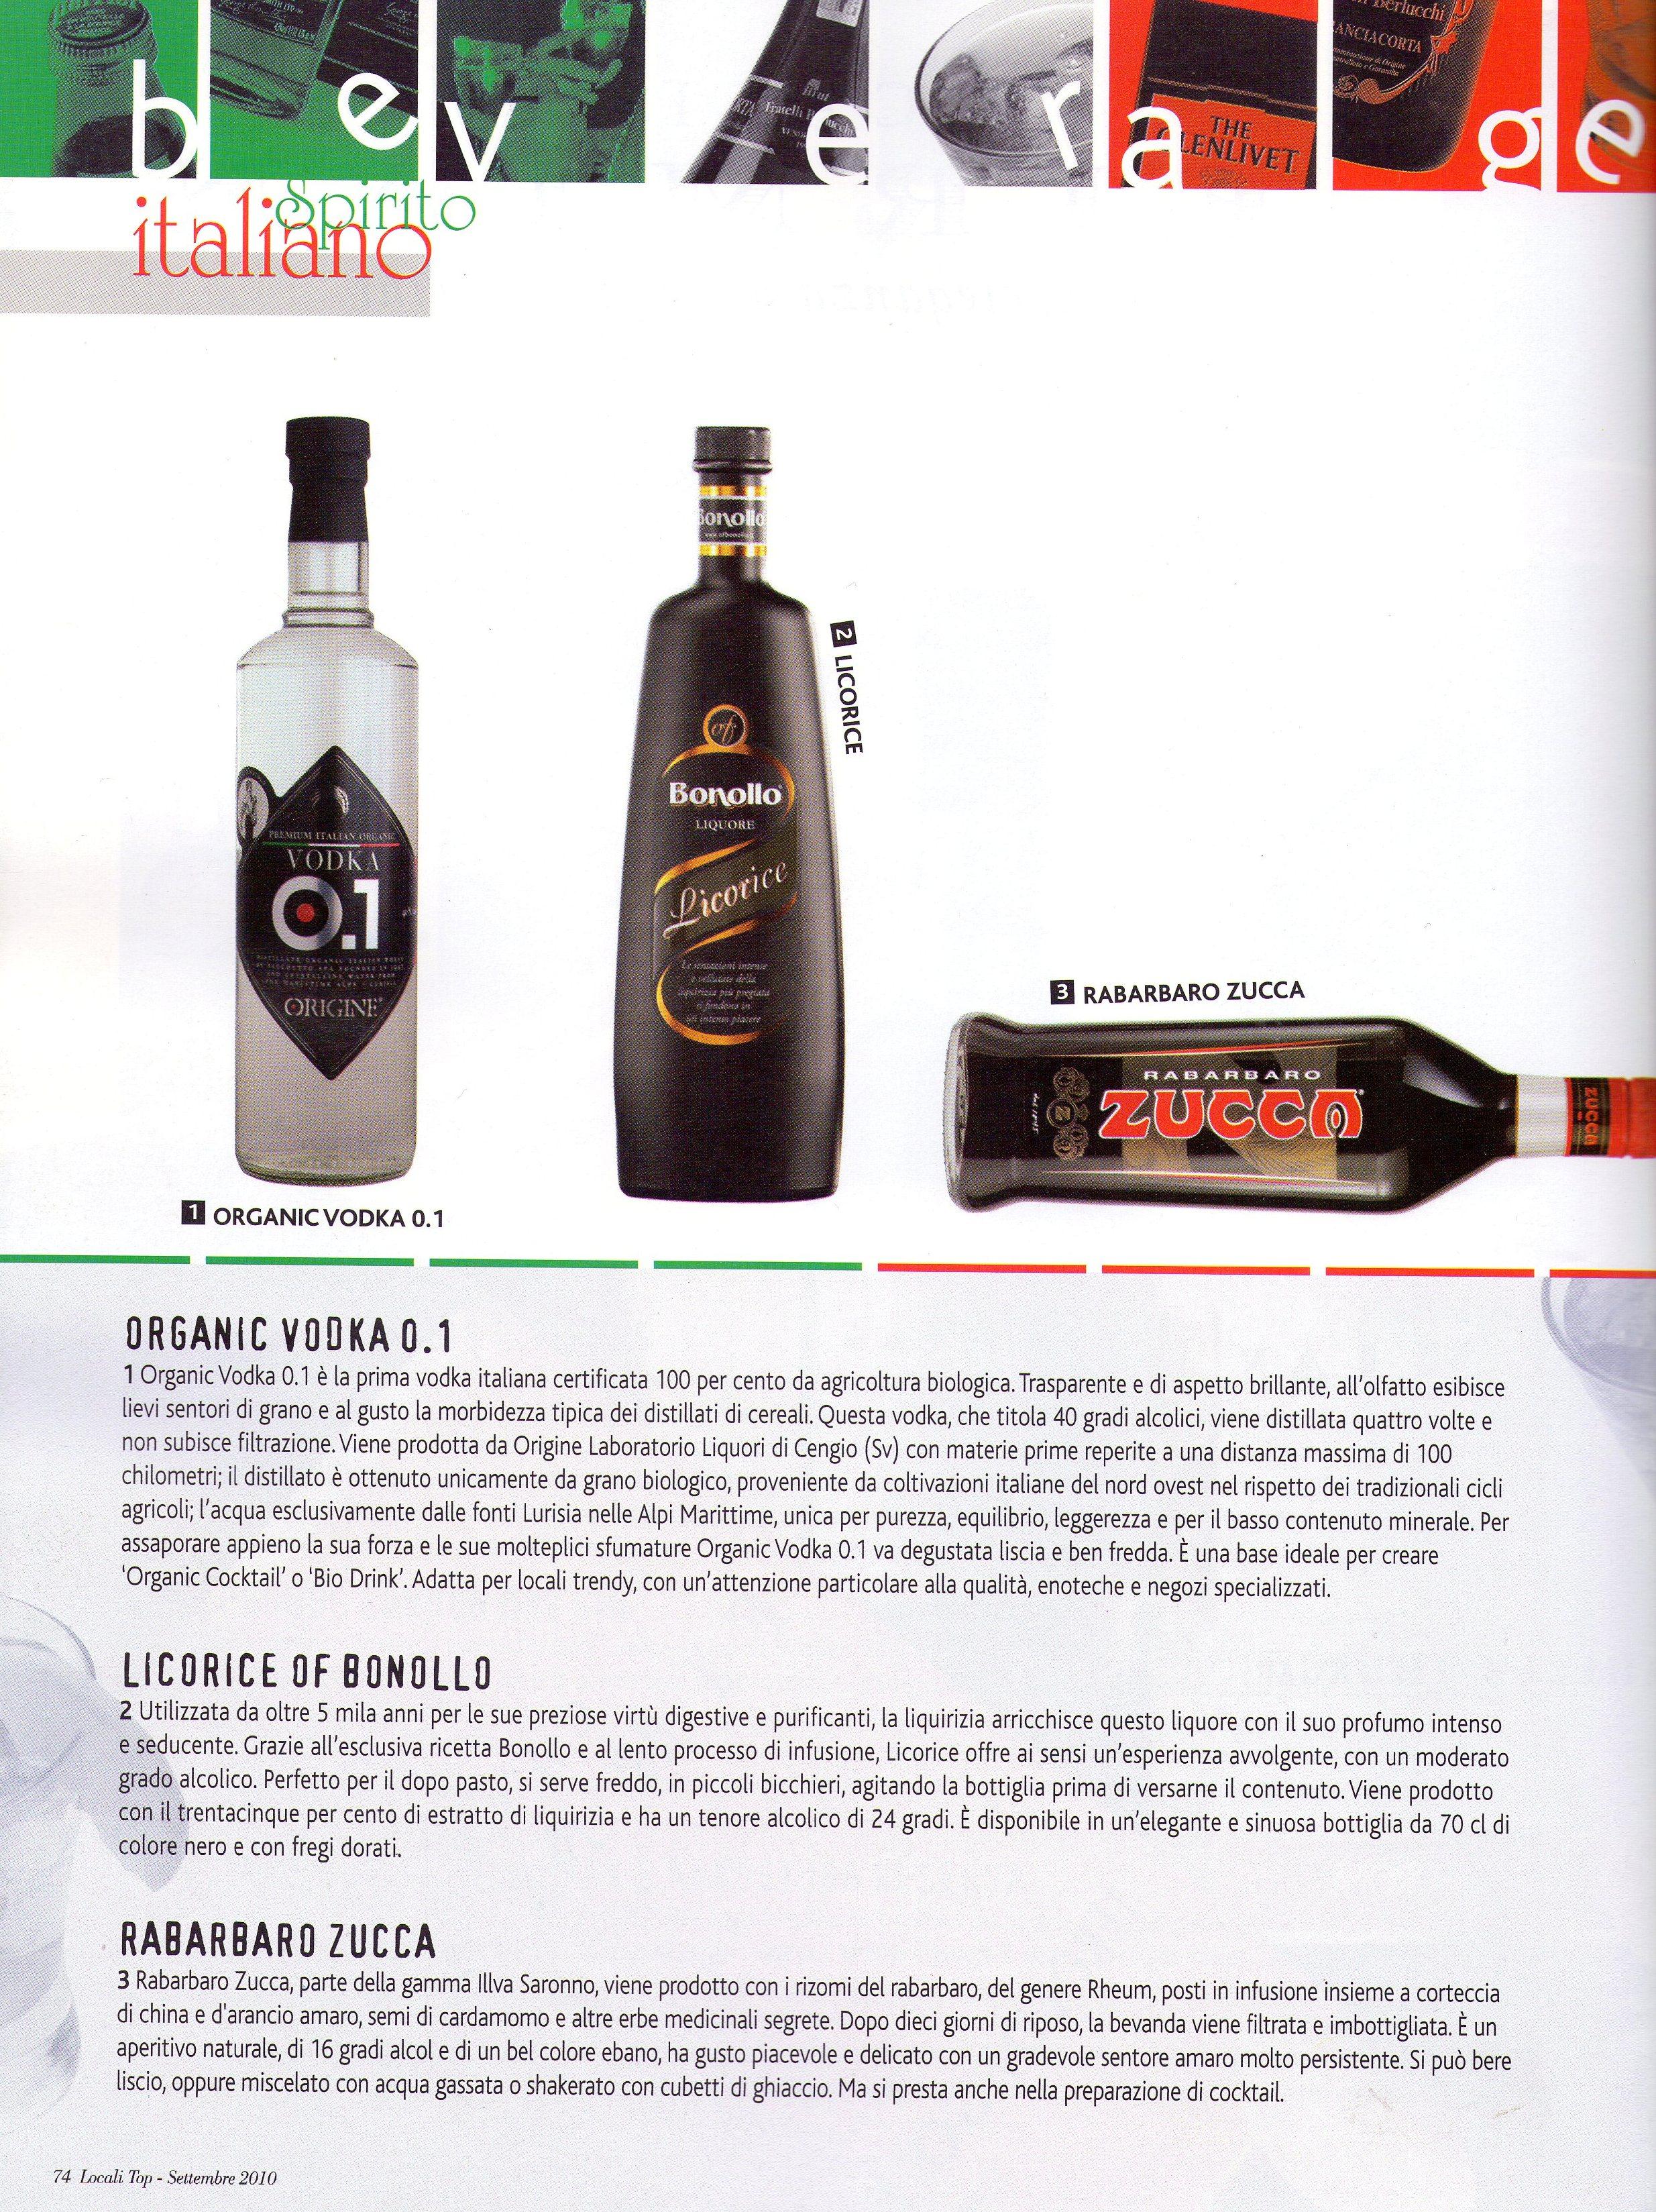 organic vodka 0.1